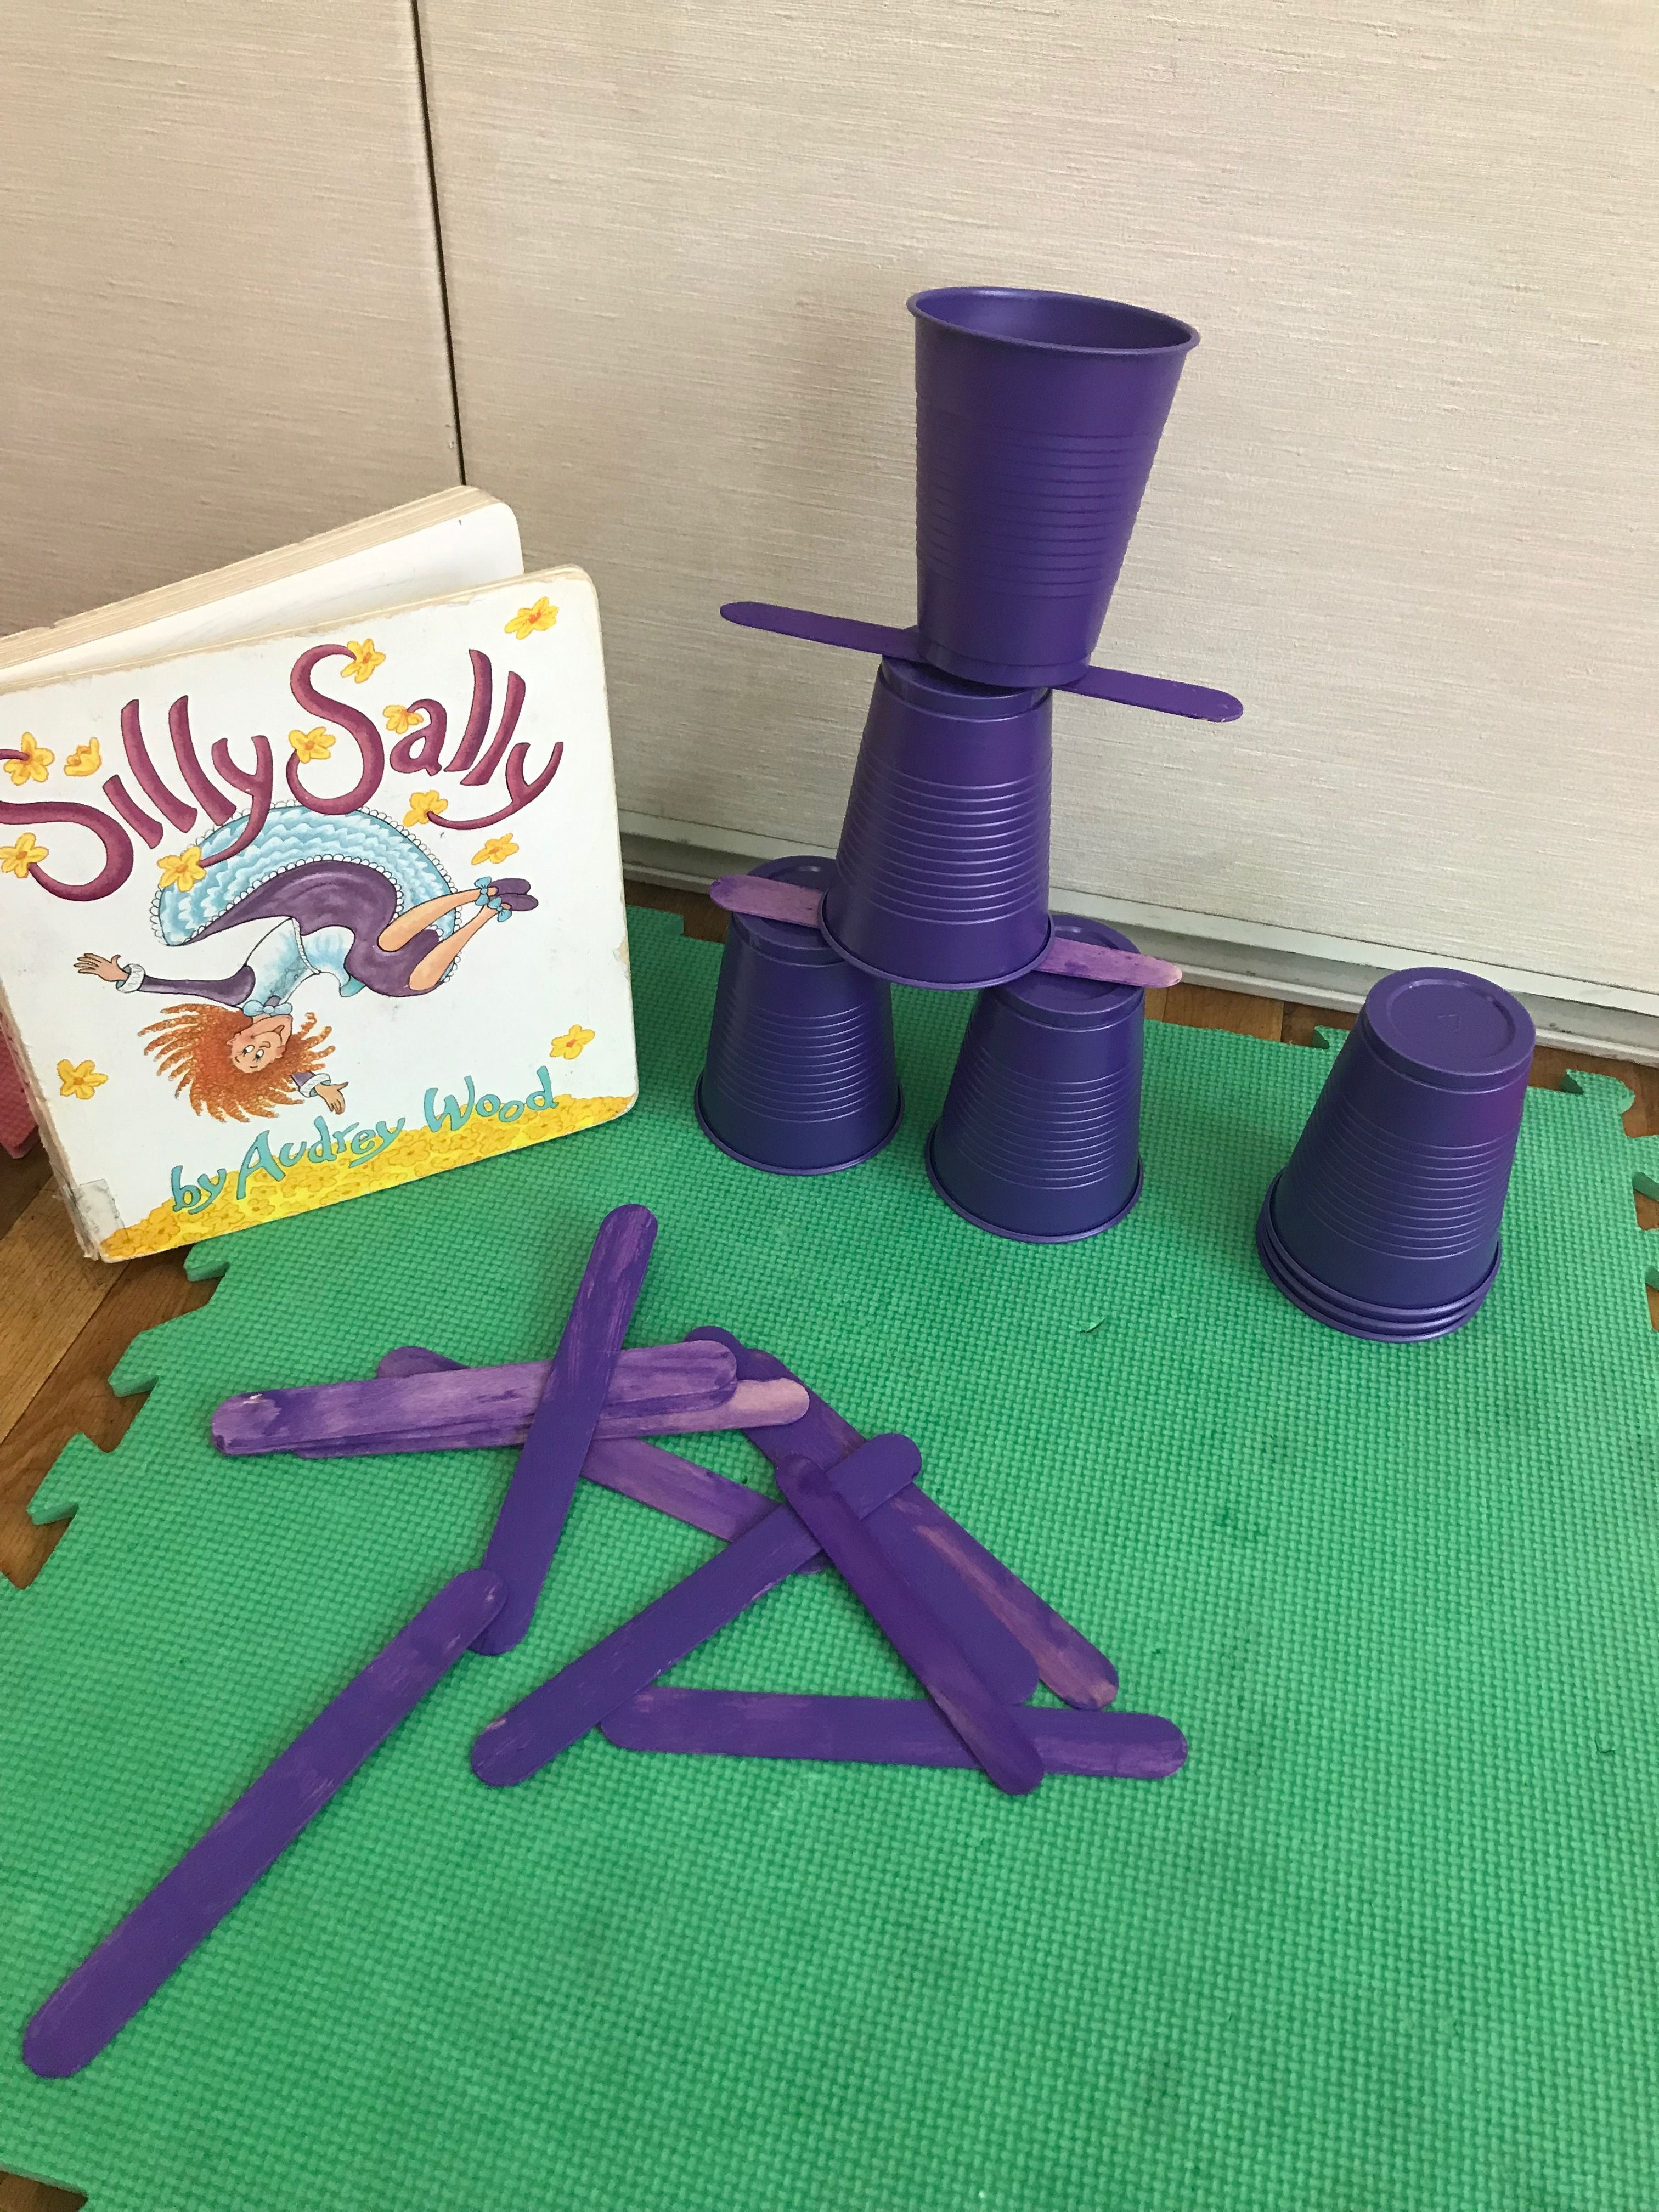 Silly Sally Stem Balancing Activity